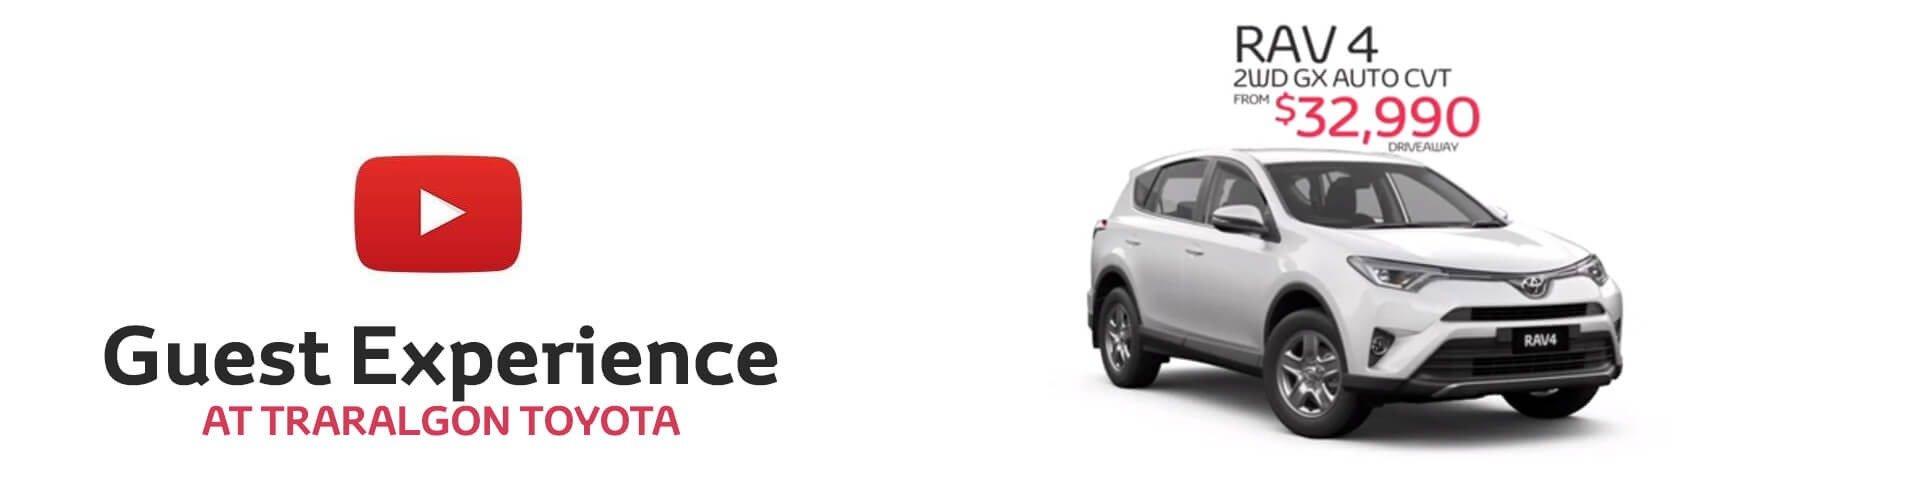 Traralgon Toyota